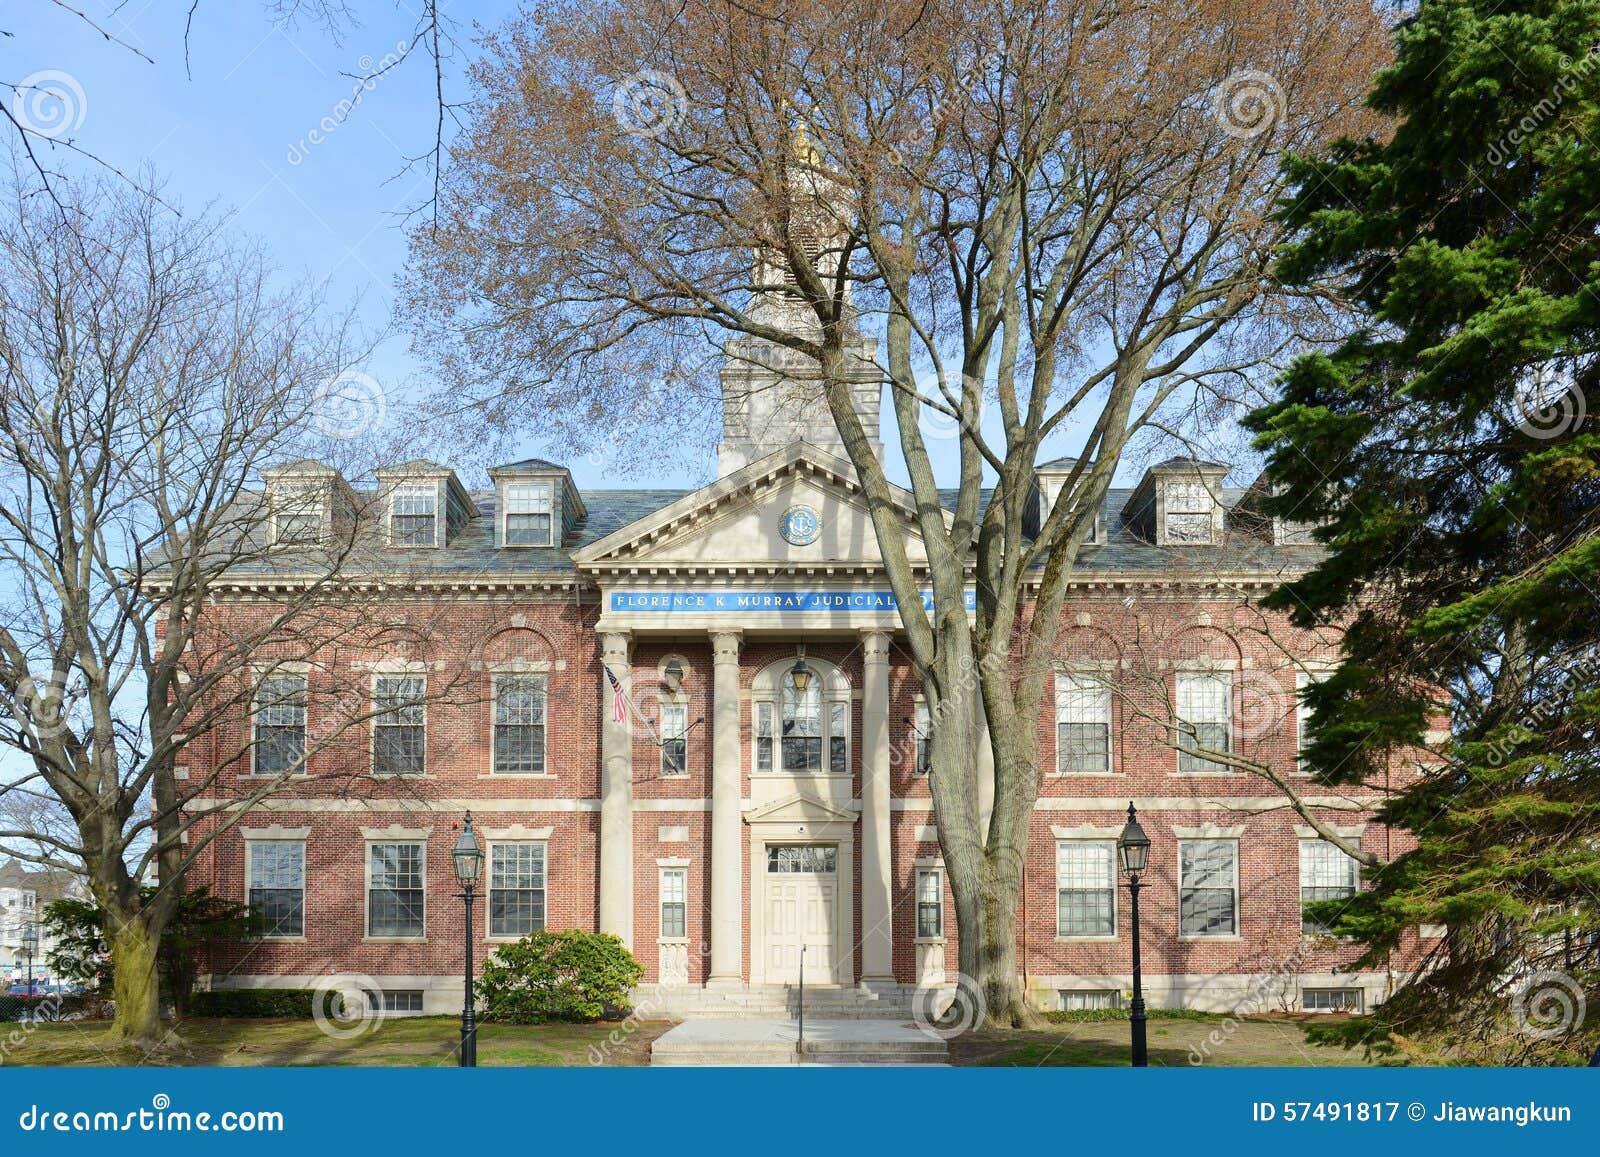 Washington County Courthouse Rhode Island